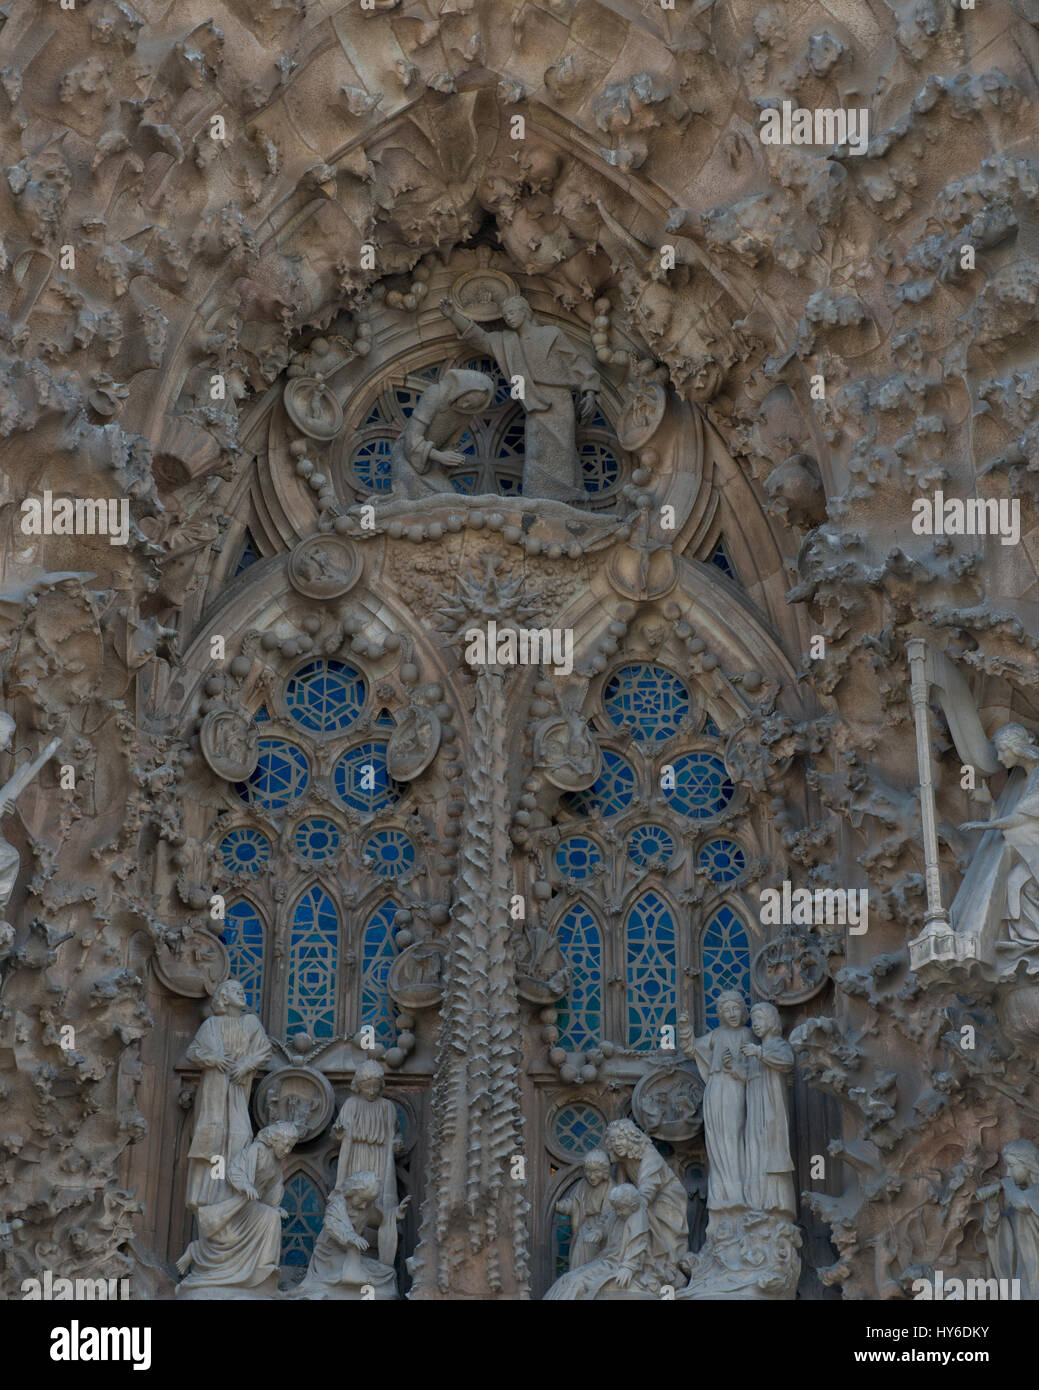 Nativity facade of Sagrada Família Basilica by Antoni Gaudí, UNESCO World Heritage site, Barcelona, Catalonia, - Stock Image